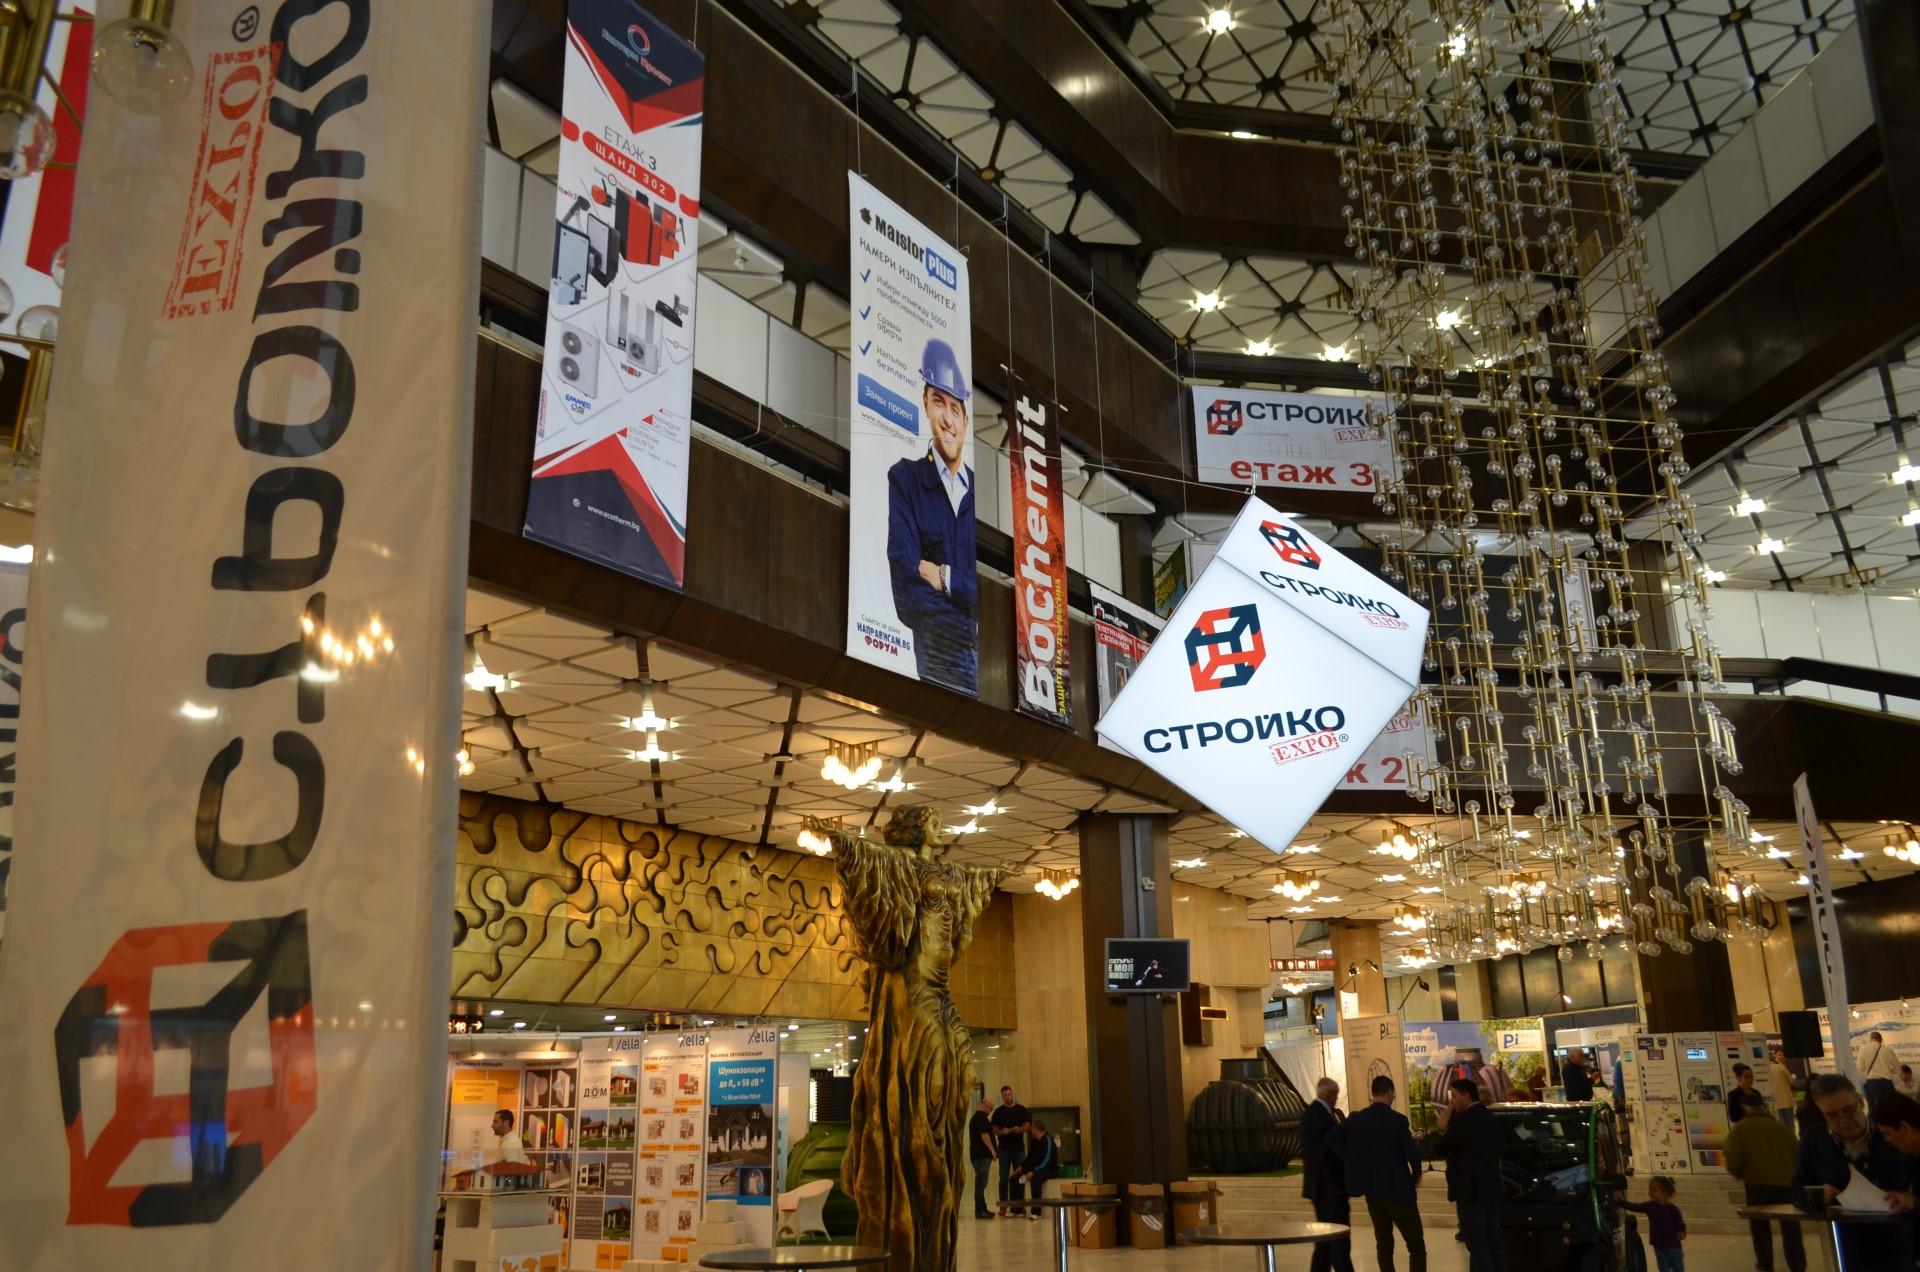 OTKRIVANE STOIKO EXPO 2019c